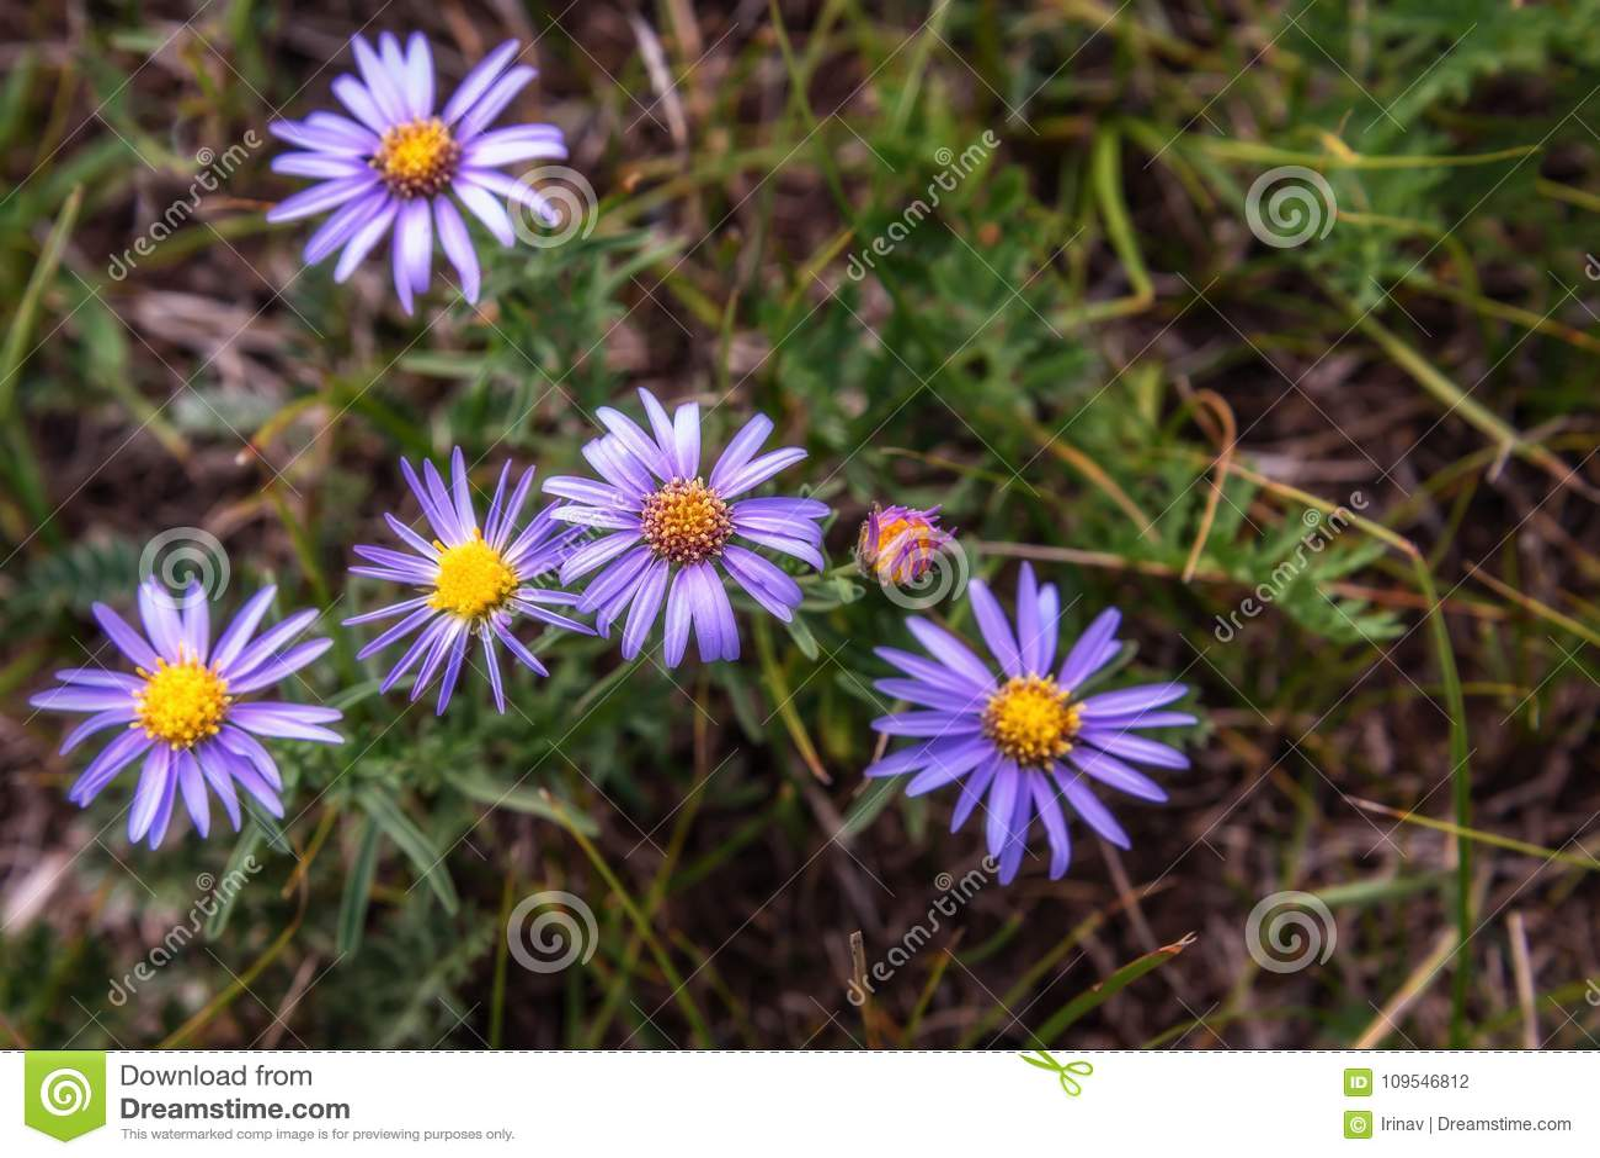 Lilac daisy flowers meadow background stock photo image of floral lilac daisy flowers meadow background izmirmasajfo Choice Image